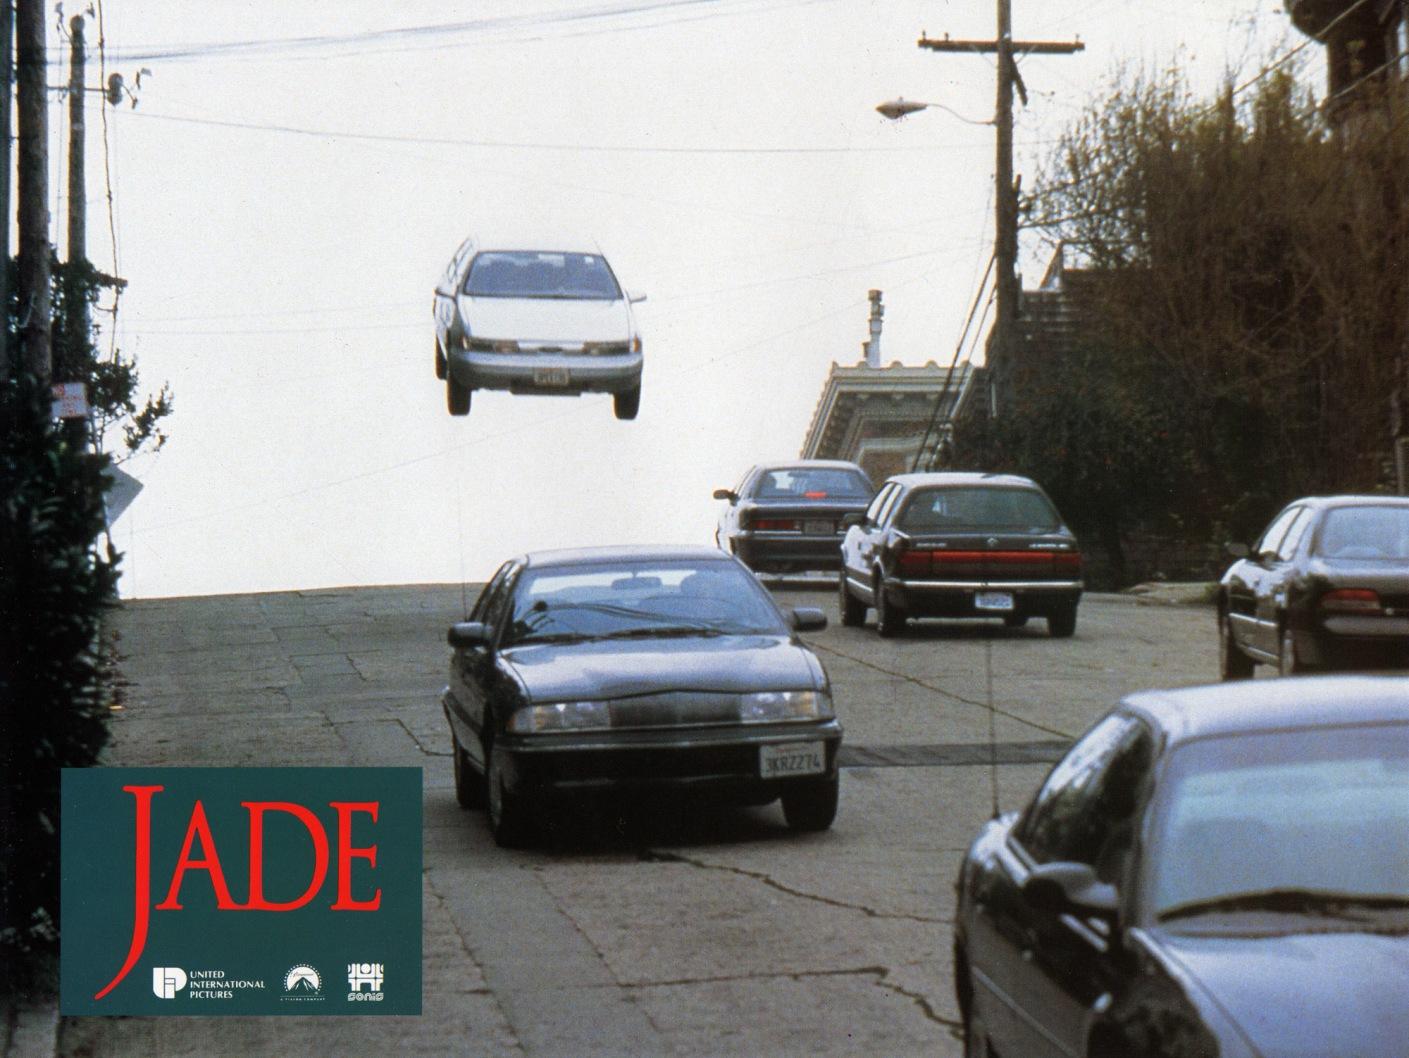 jade-france-04